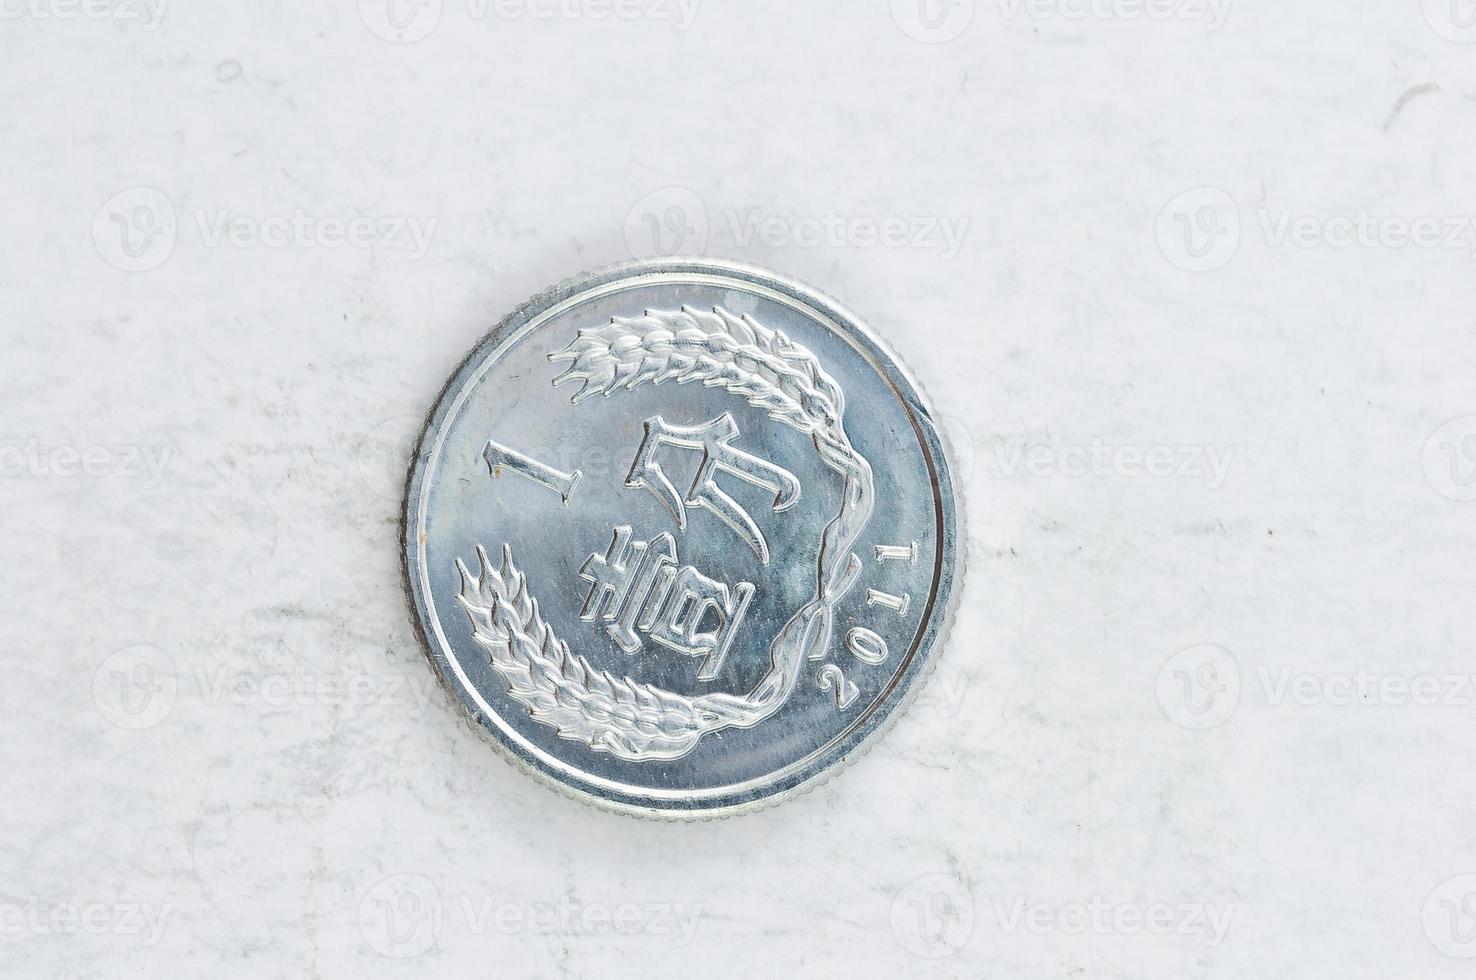 1 yi jiao pièce chinoise argent alu photo